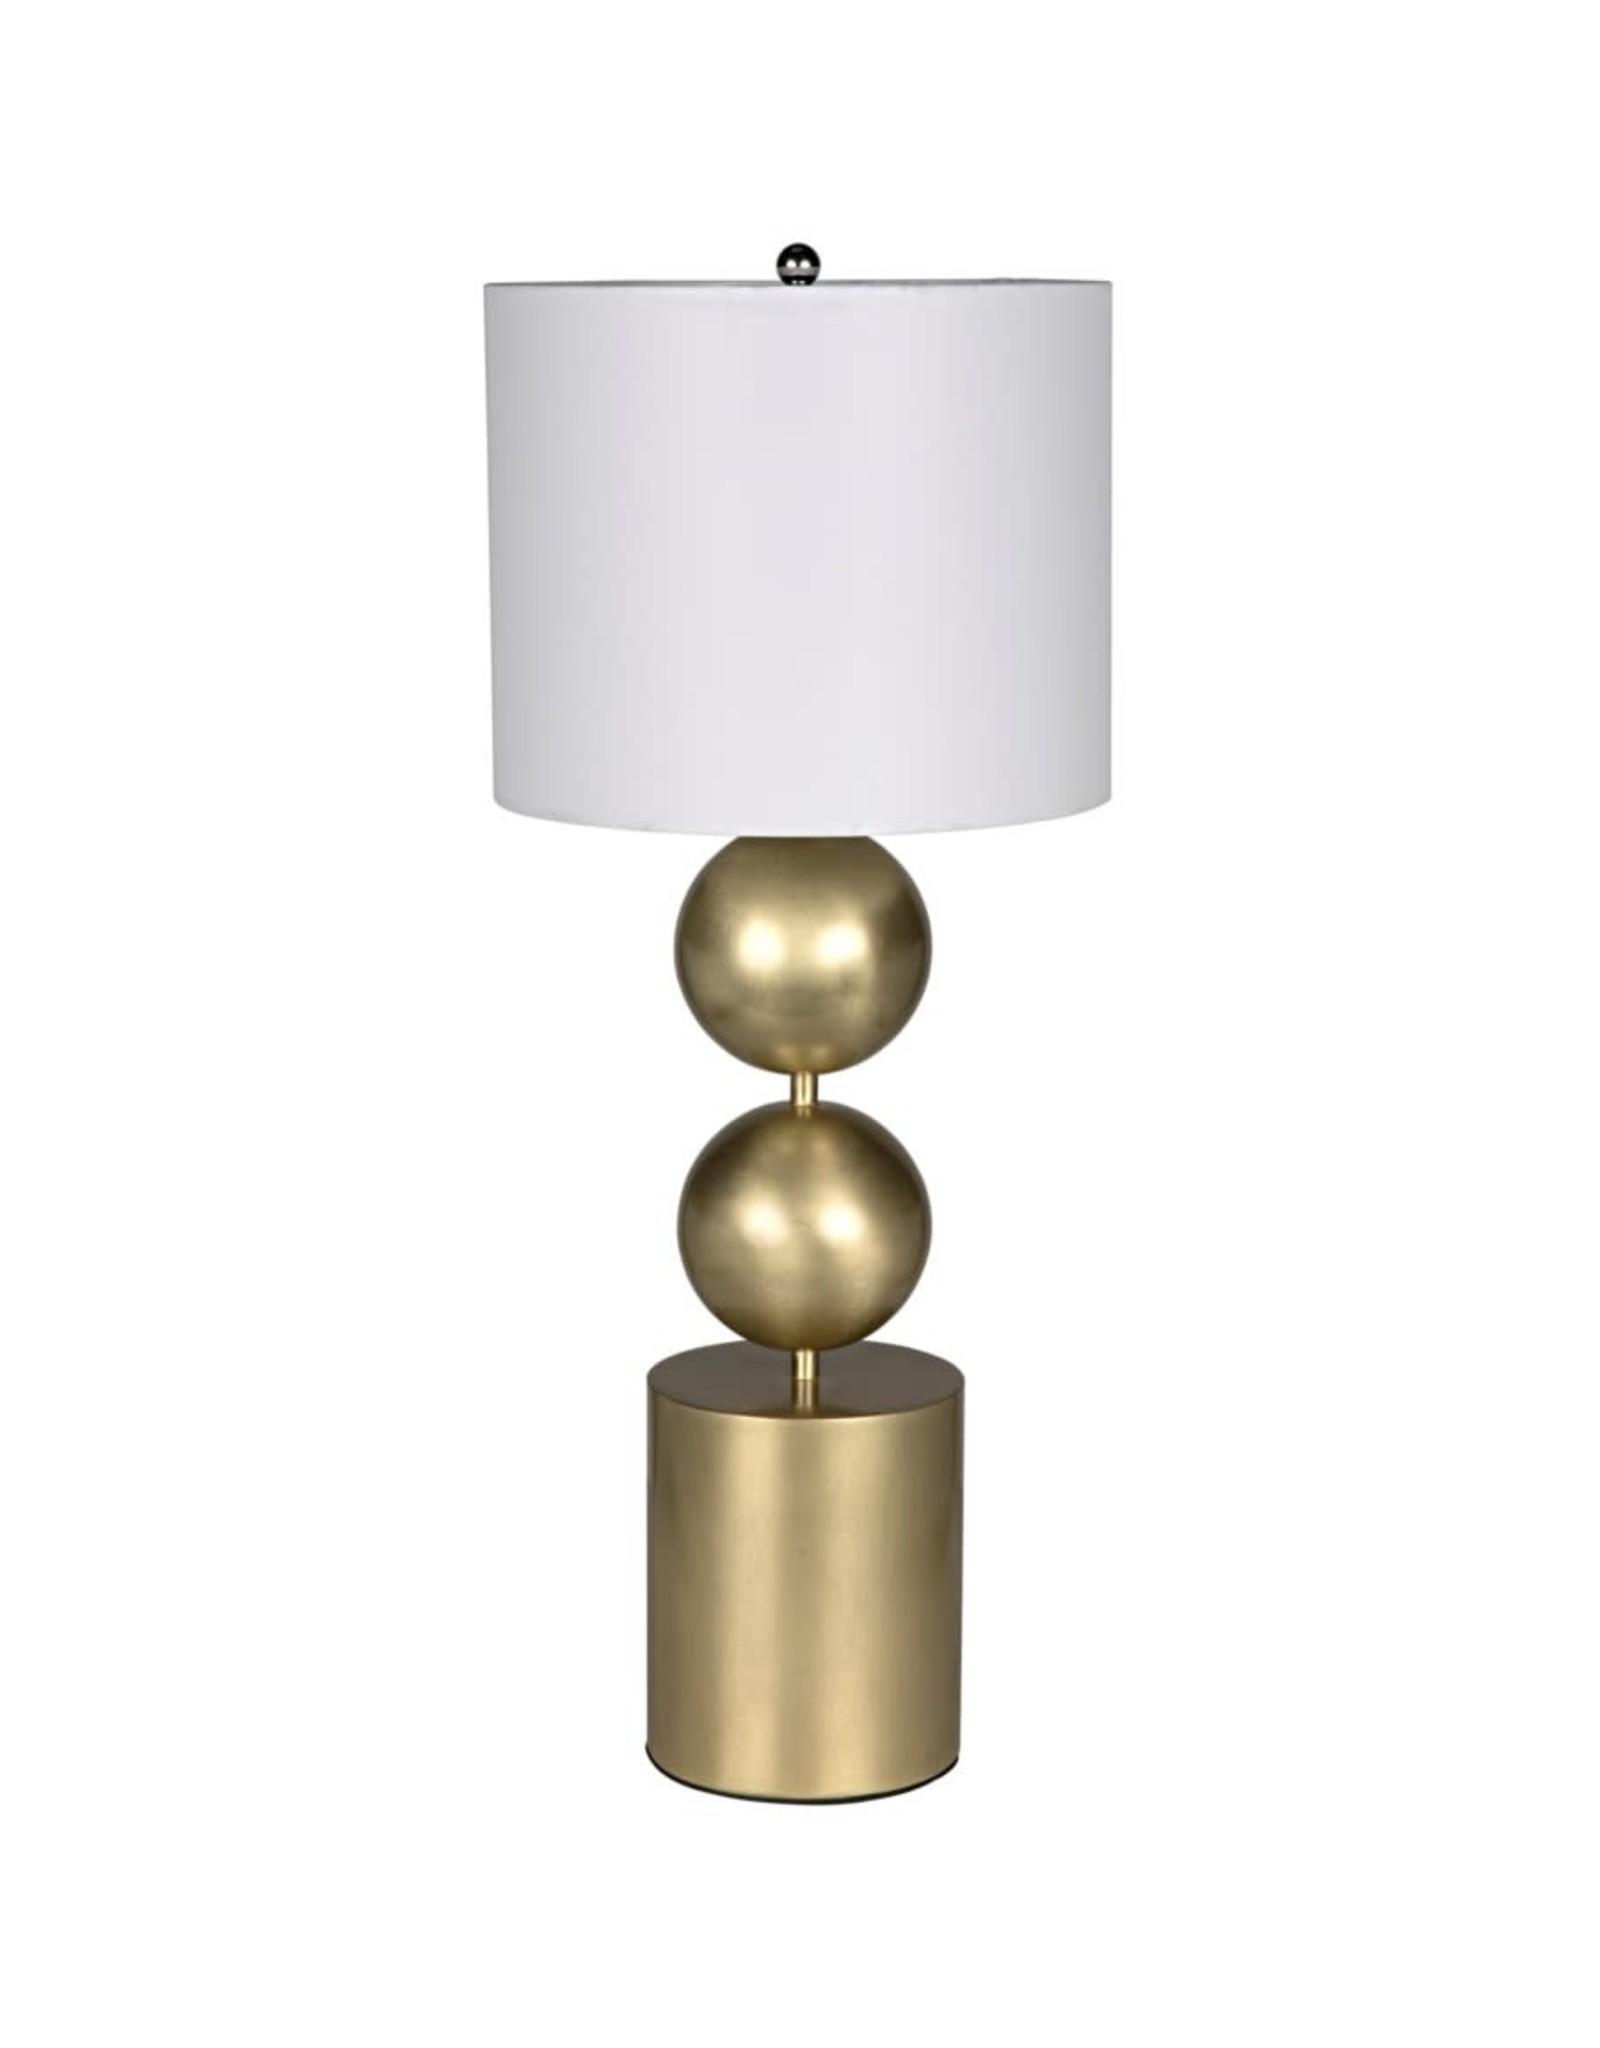 Website Noir Tulum Table Lamp - Metal with Brass Finish